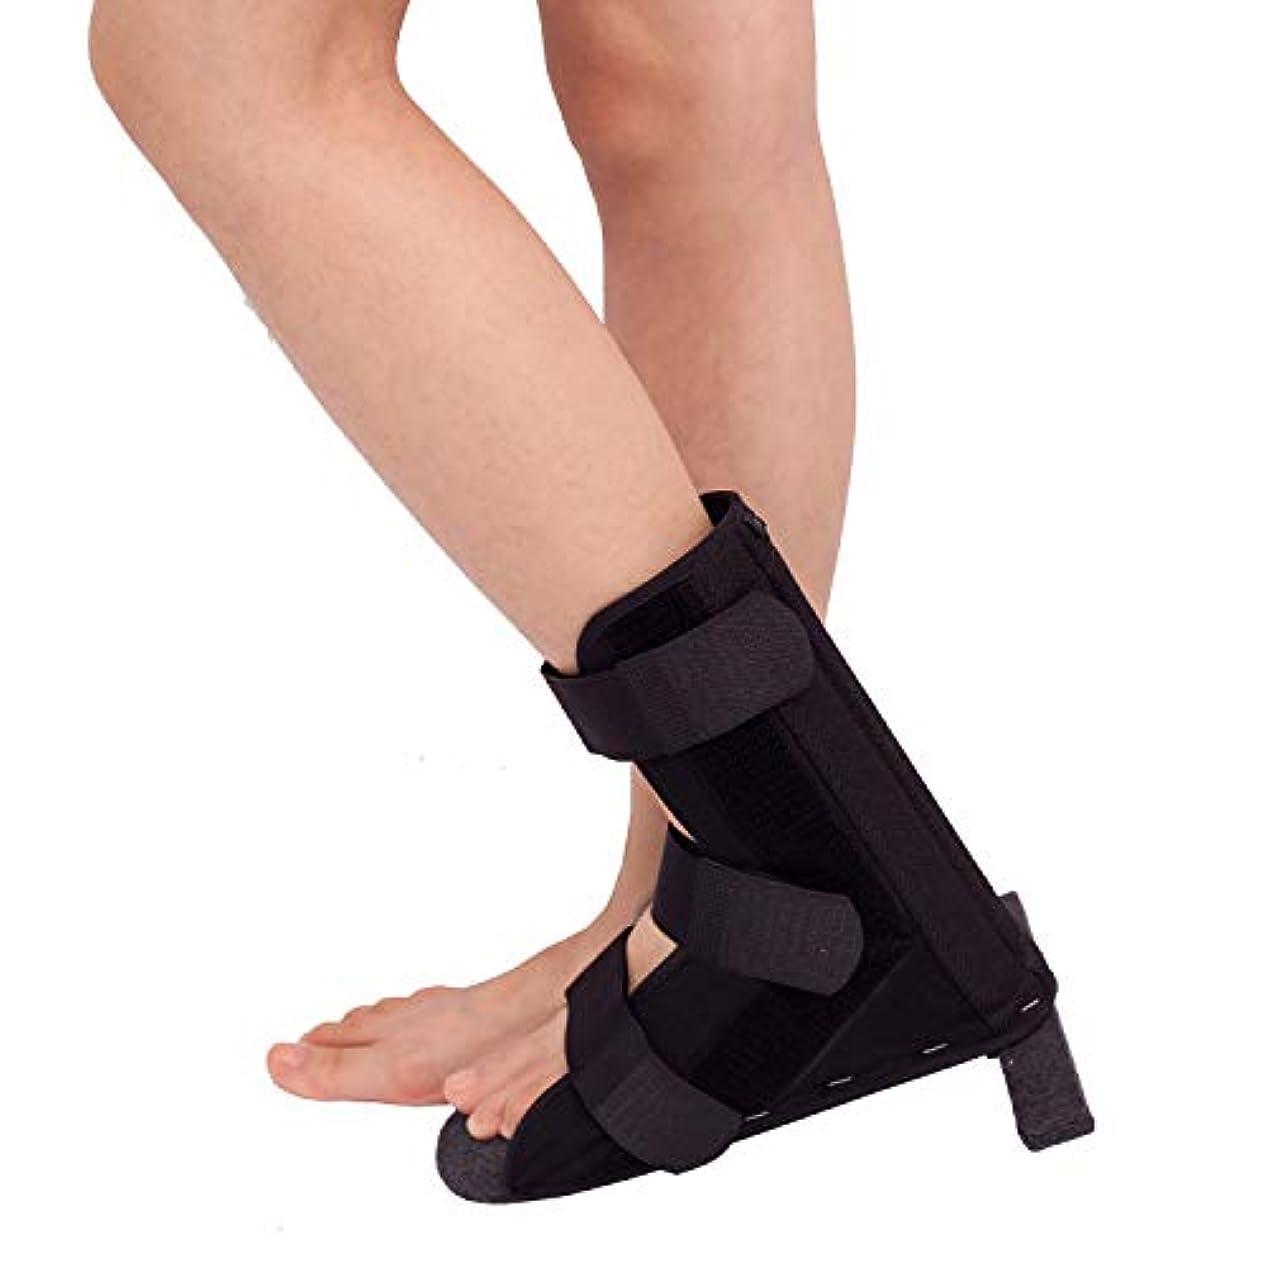 前部評価可能実行足首サポート ア、T字型靴、整形外科用靴、足首骨折、捻挫固定ブラケット (Size : L)